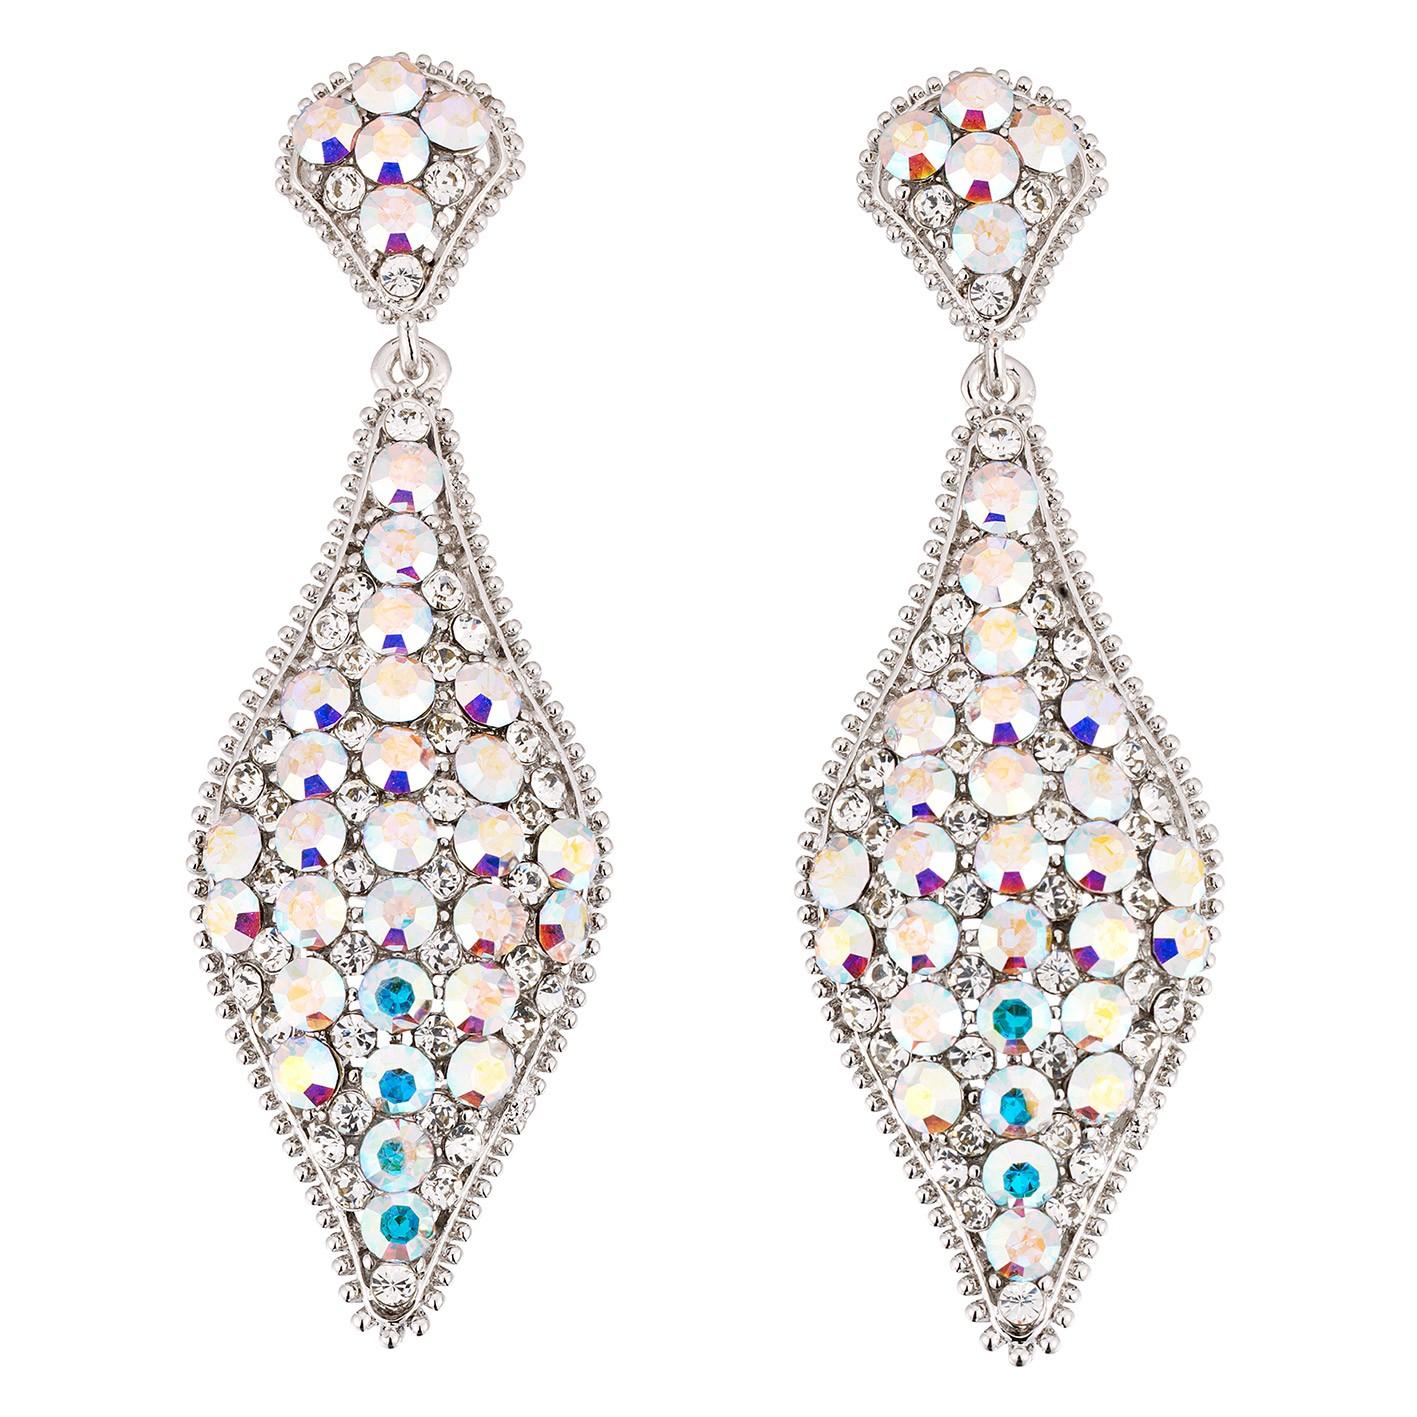 Swarovski Crystal Beauty Pageant Swarovski Crystal Ab Crystal Earrings Gemini Jewellery London Necklaces Earrings Bracelets And Hairpieces